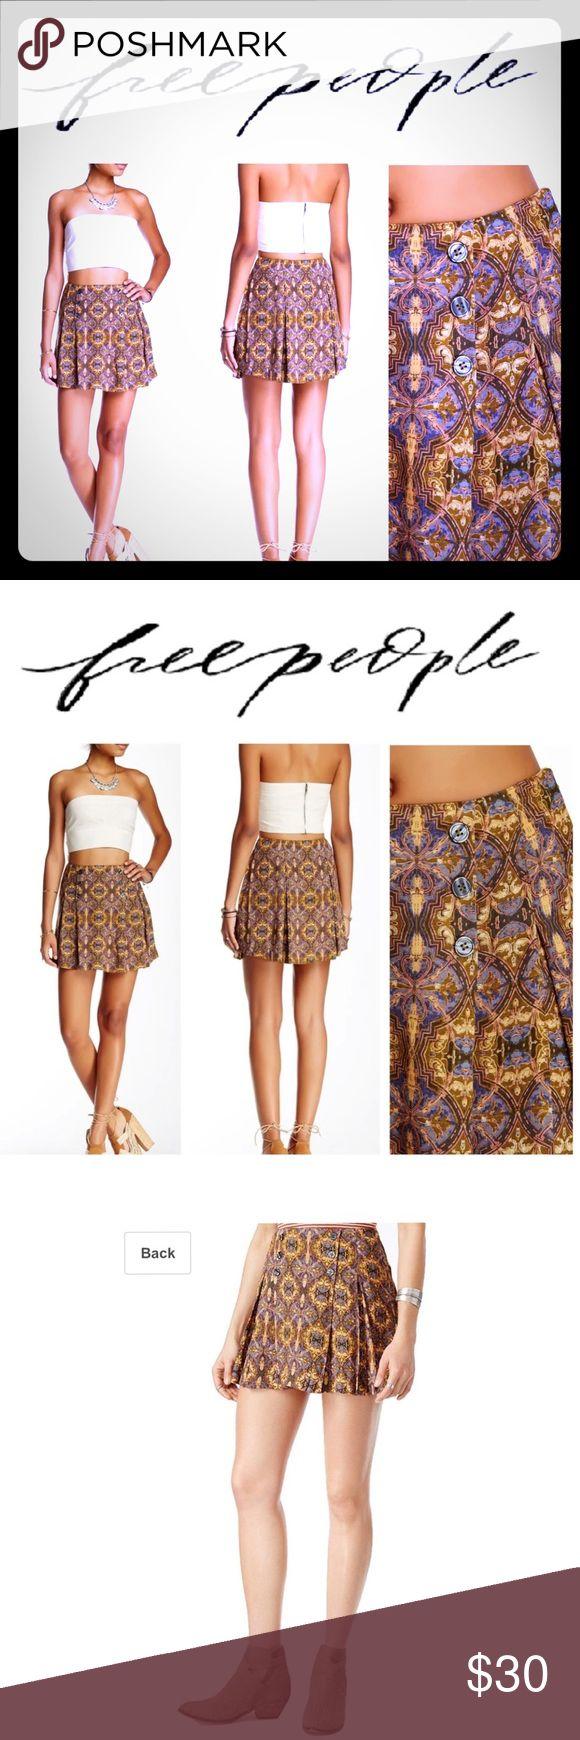 NWT 🏷 FREE PEOPLE Lover's Lane Printed Mini Skirt FREE PEOPLE Lover's…